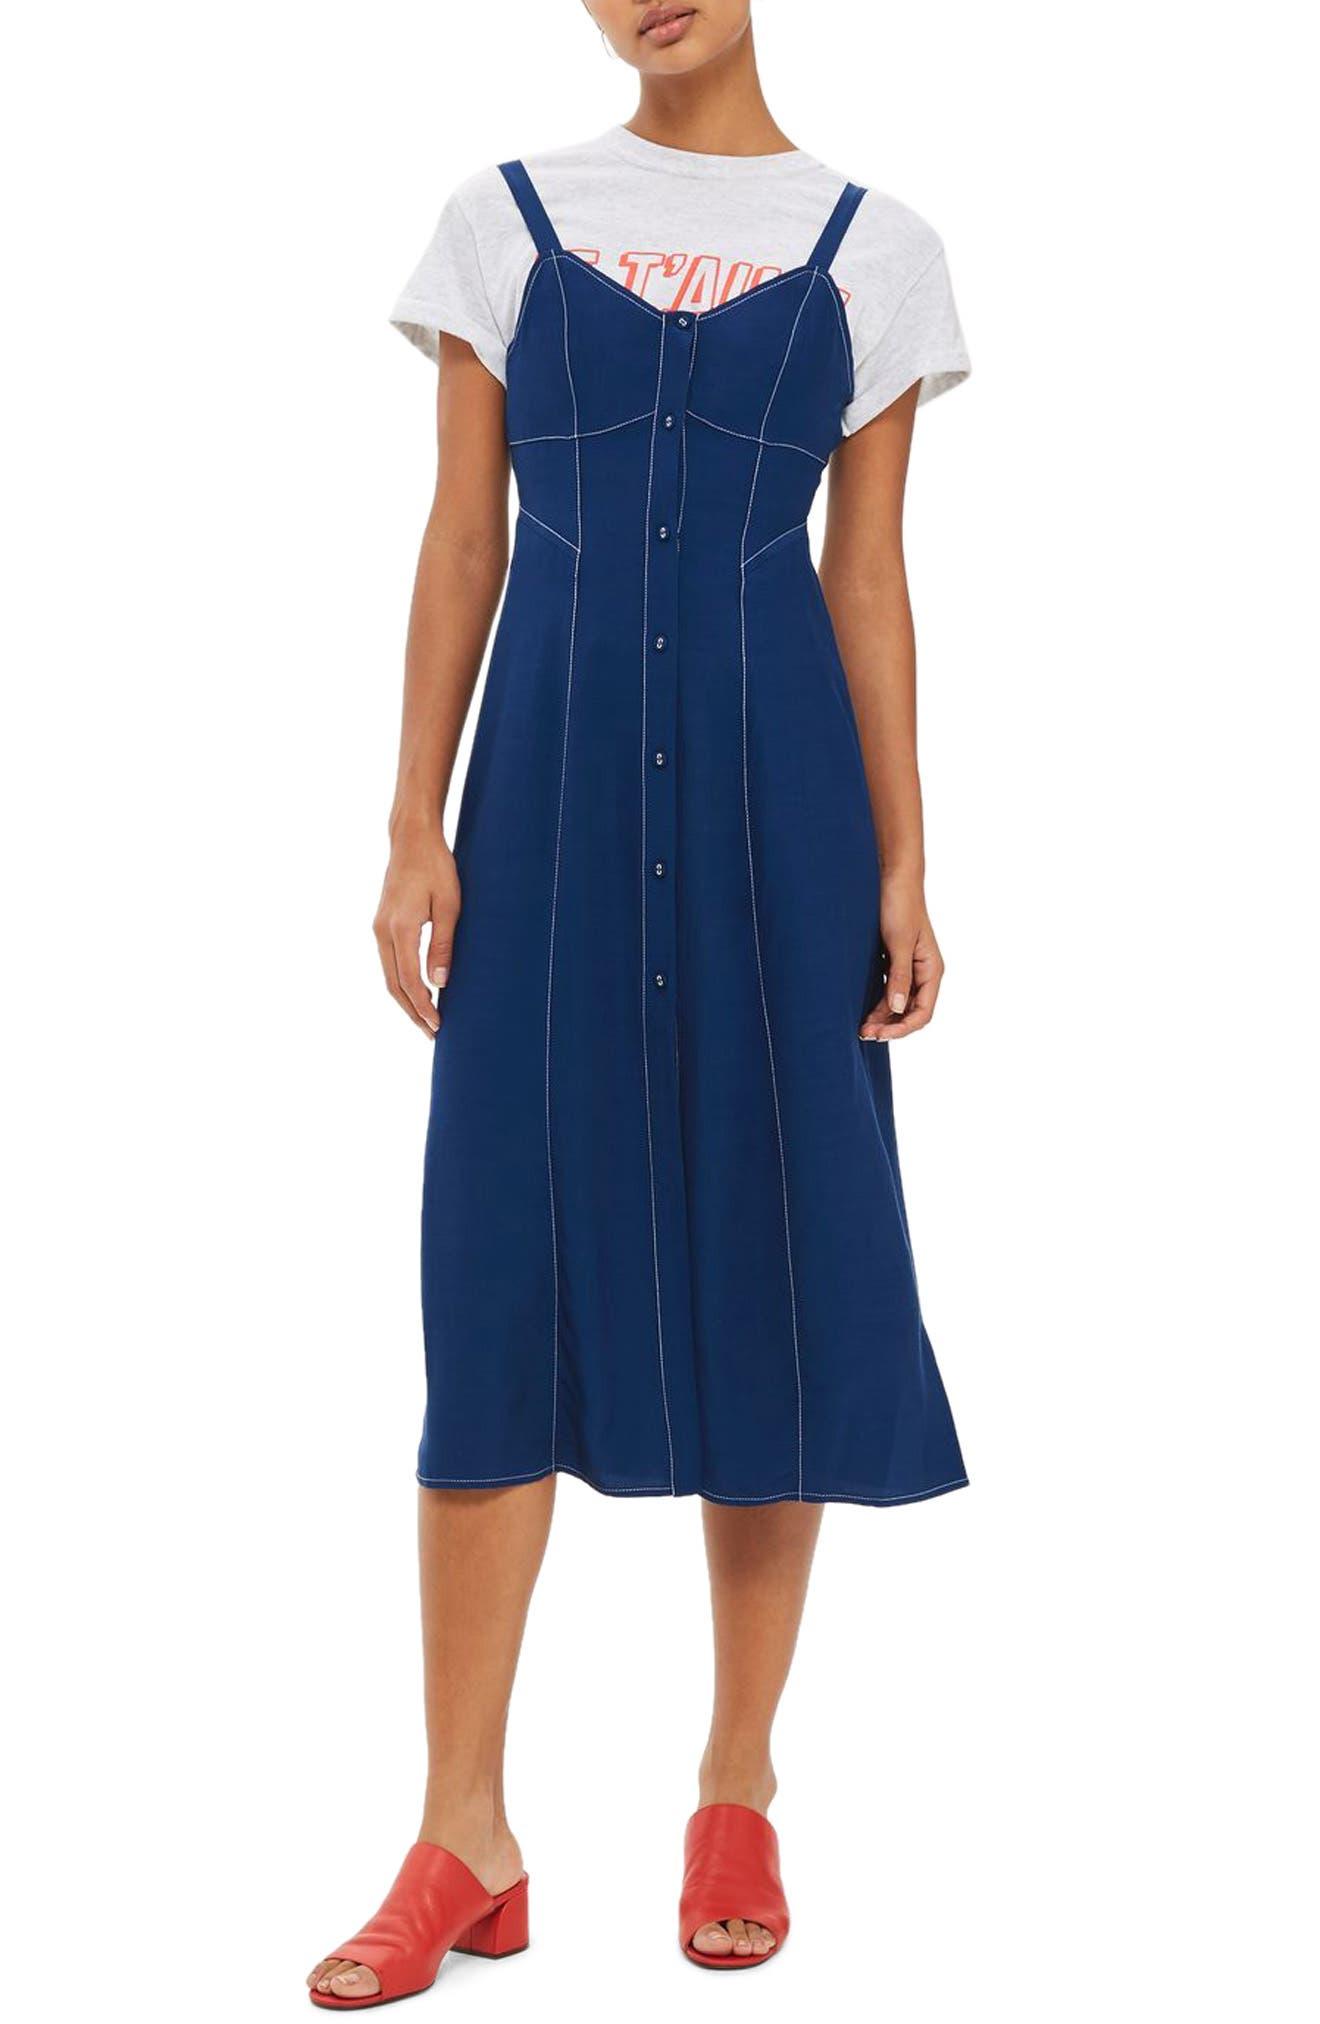 Topstitch Corset Midi Dress,                         Main,                         color, 410